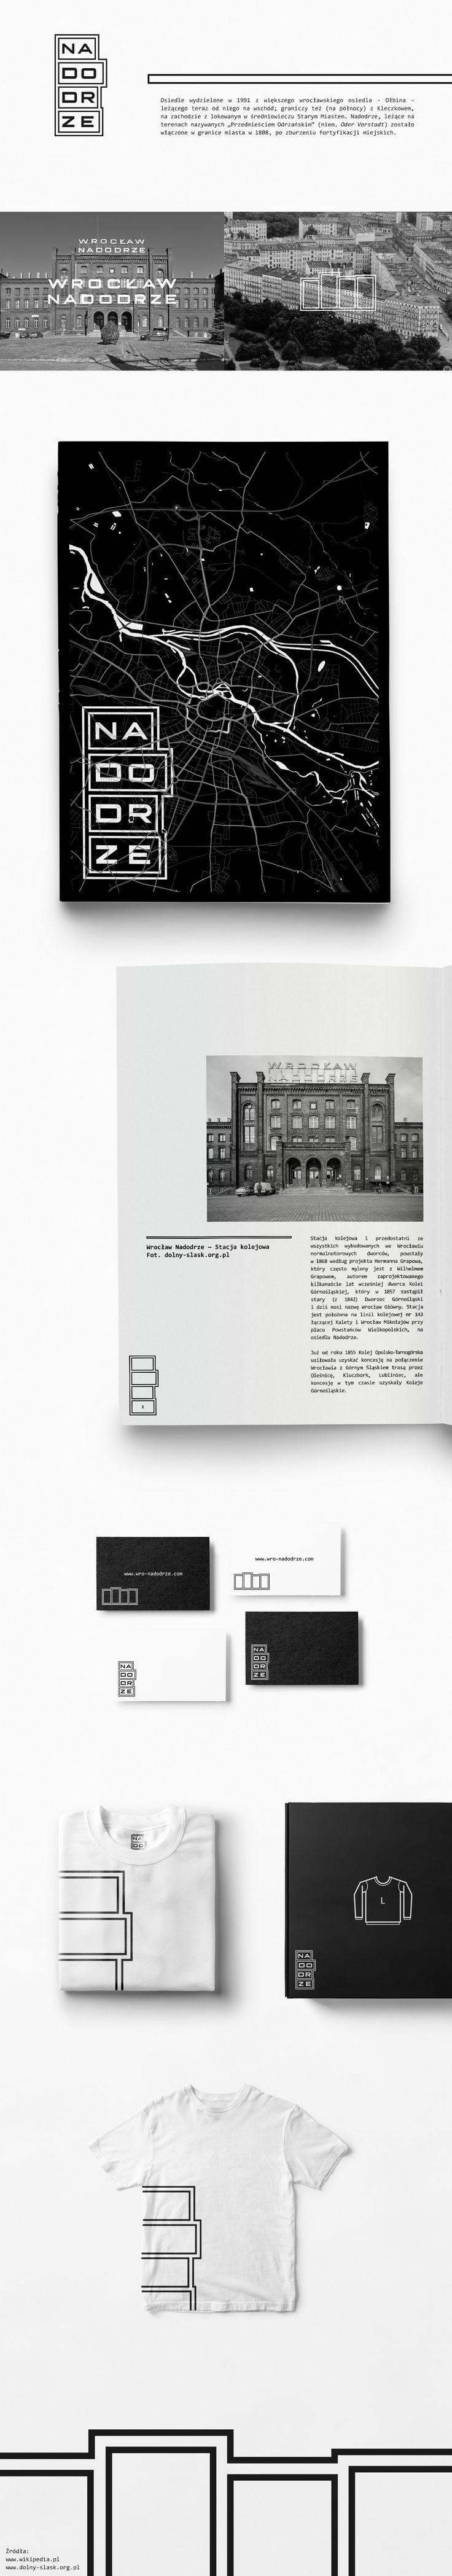 "Przejrzyj mój projekt w @Behance: ""Wrocław Nadodrze"" https://www.behance.net/gallery/45141027/Wroclaw-Nadodrze"